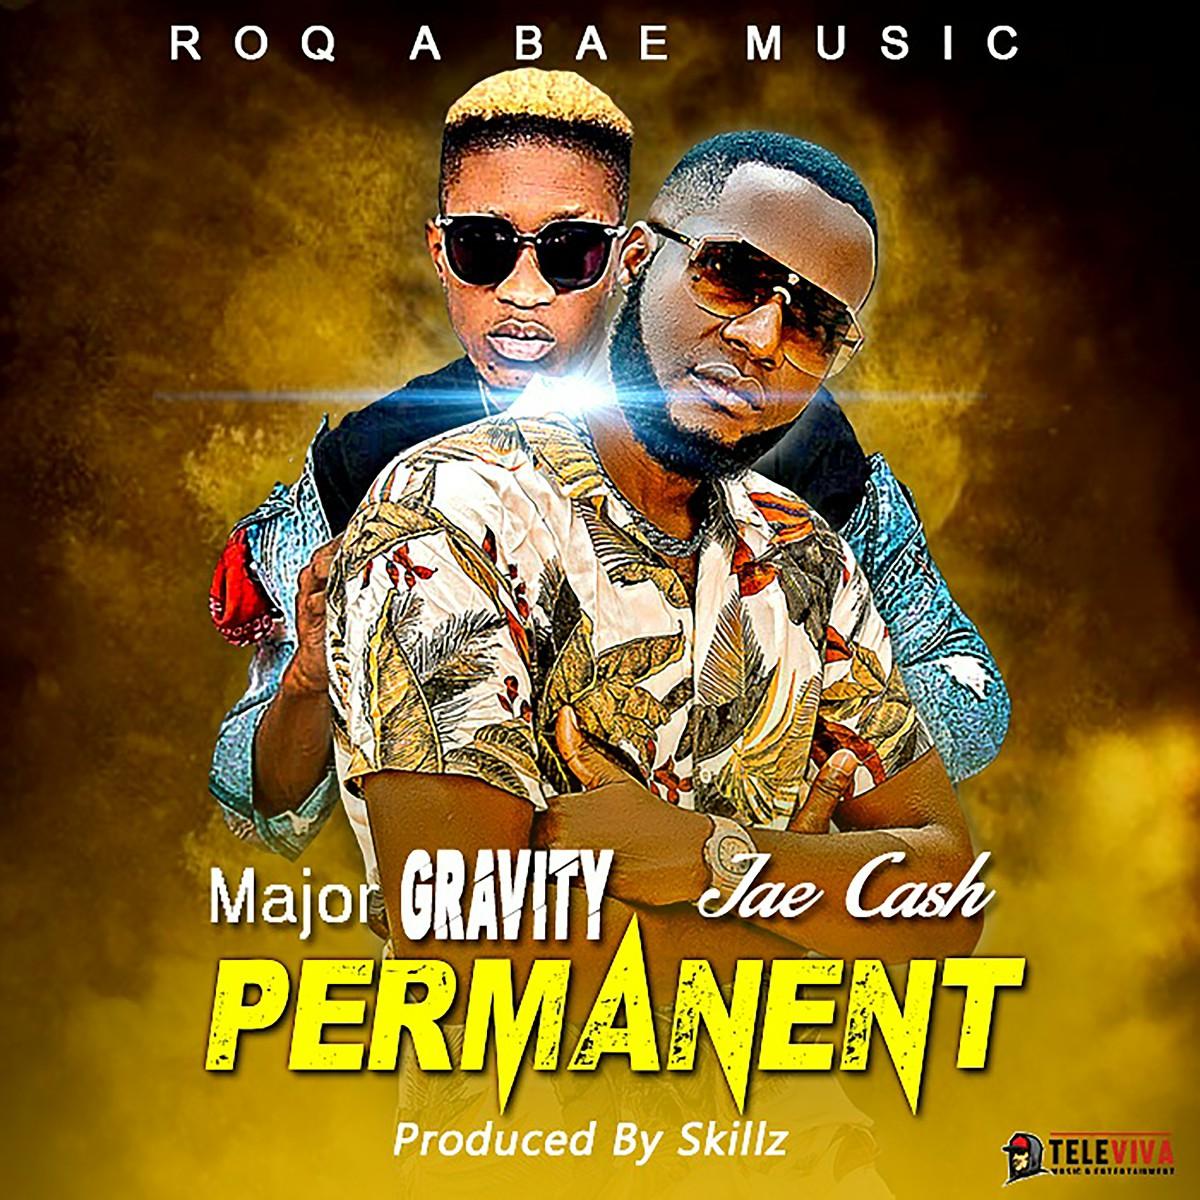 Major Gravity ft. Jae Cash - Permanent